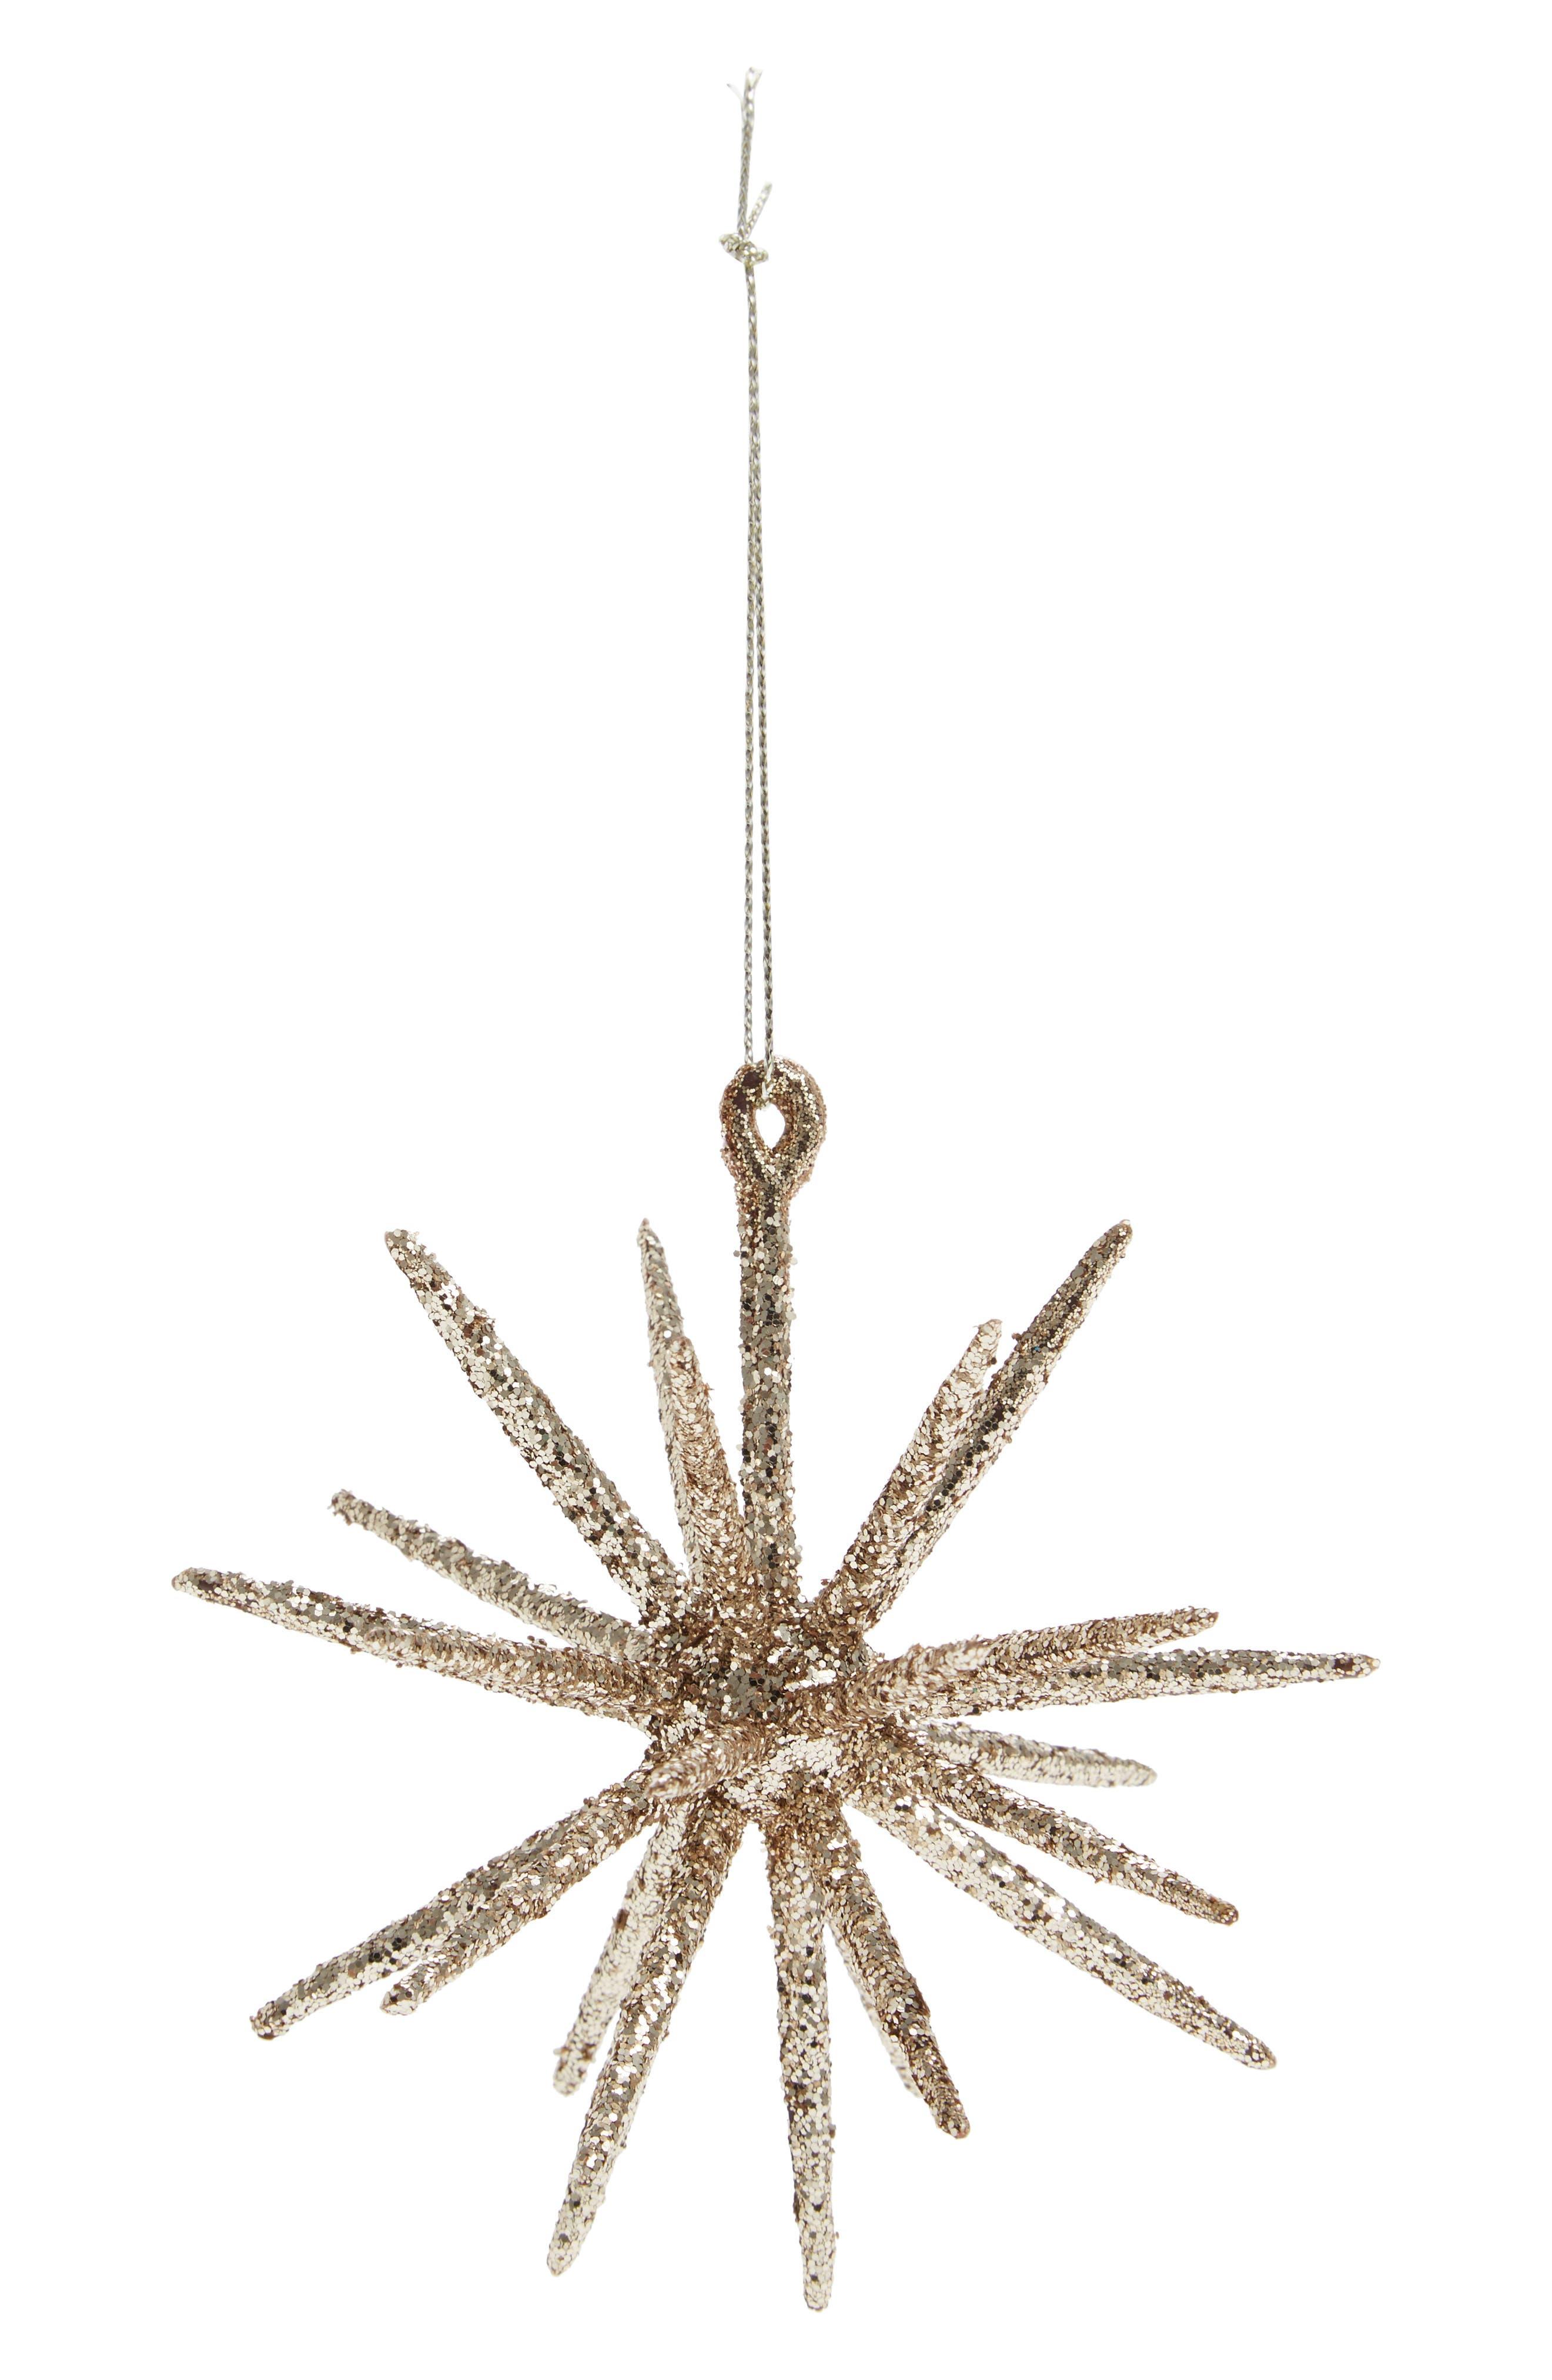 Nordstrom at Home Starburst Ornament